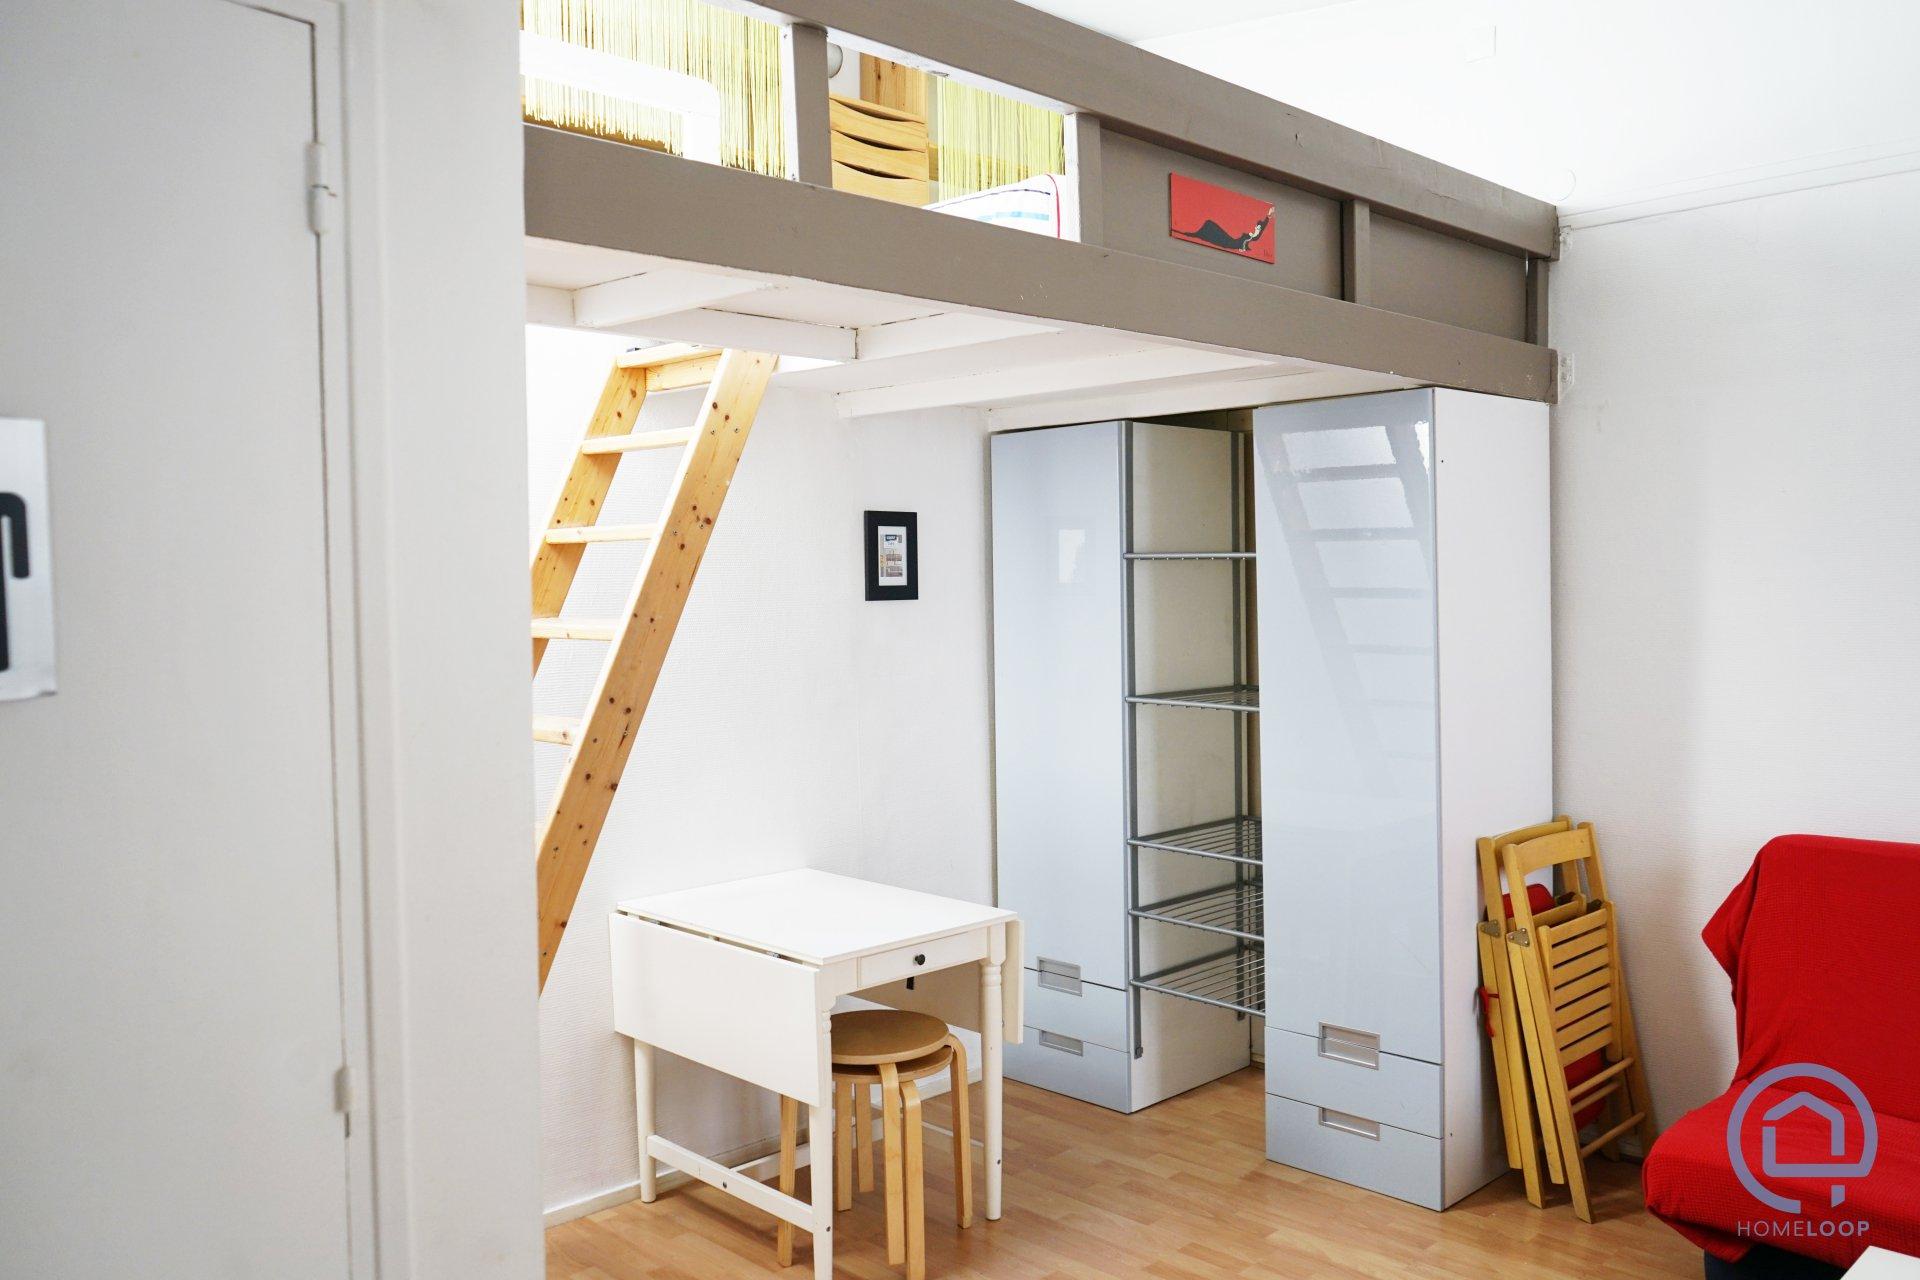 Studio idéal pour un investissement locatif